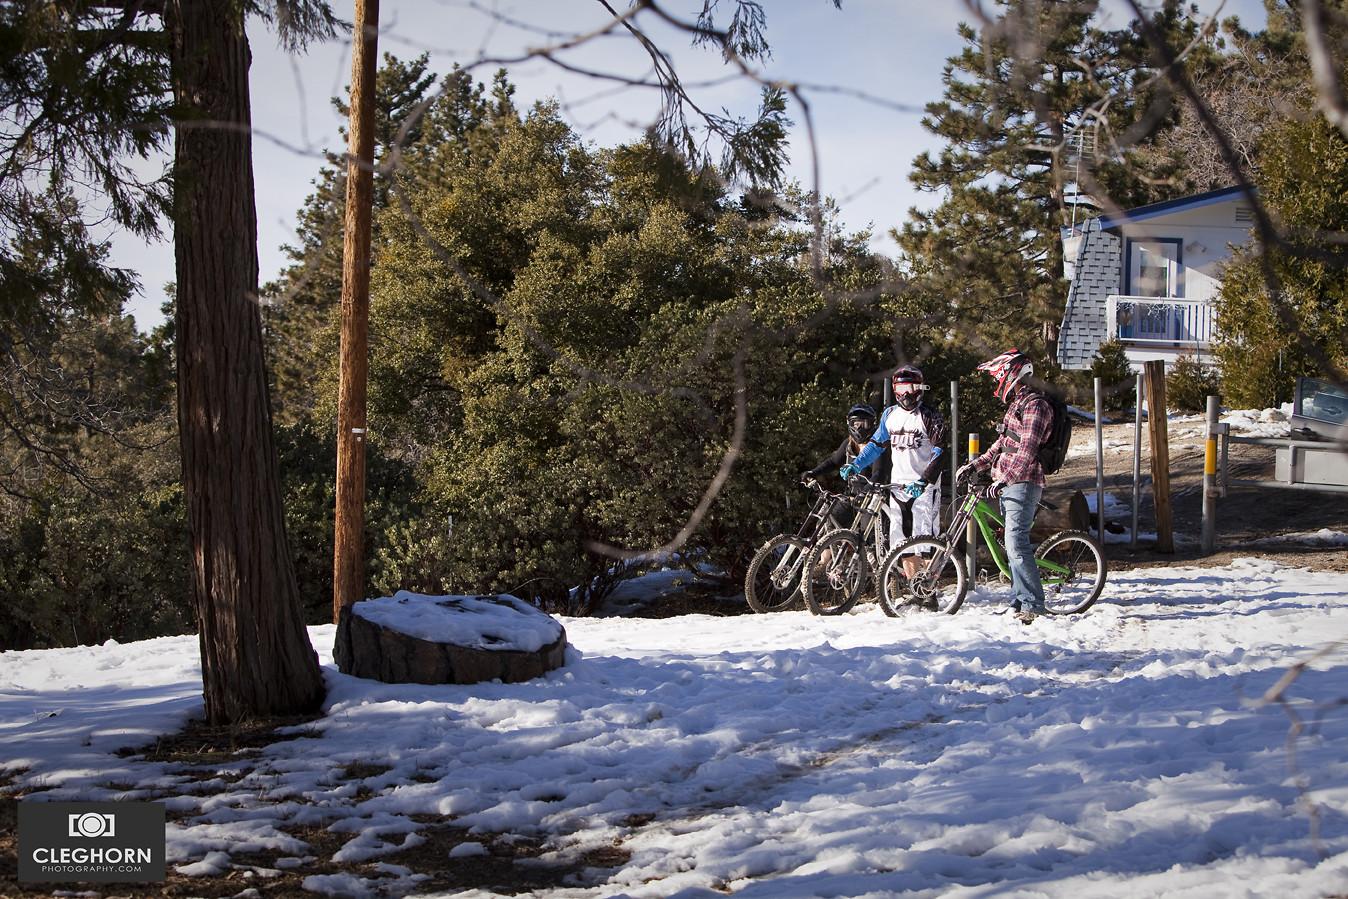 Chris Skudlarski, David Klaassen Van Oorschot and Erica Purcell - Cleghorn Photography - Mountain Biking Pictures - Vital MTB